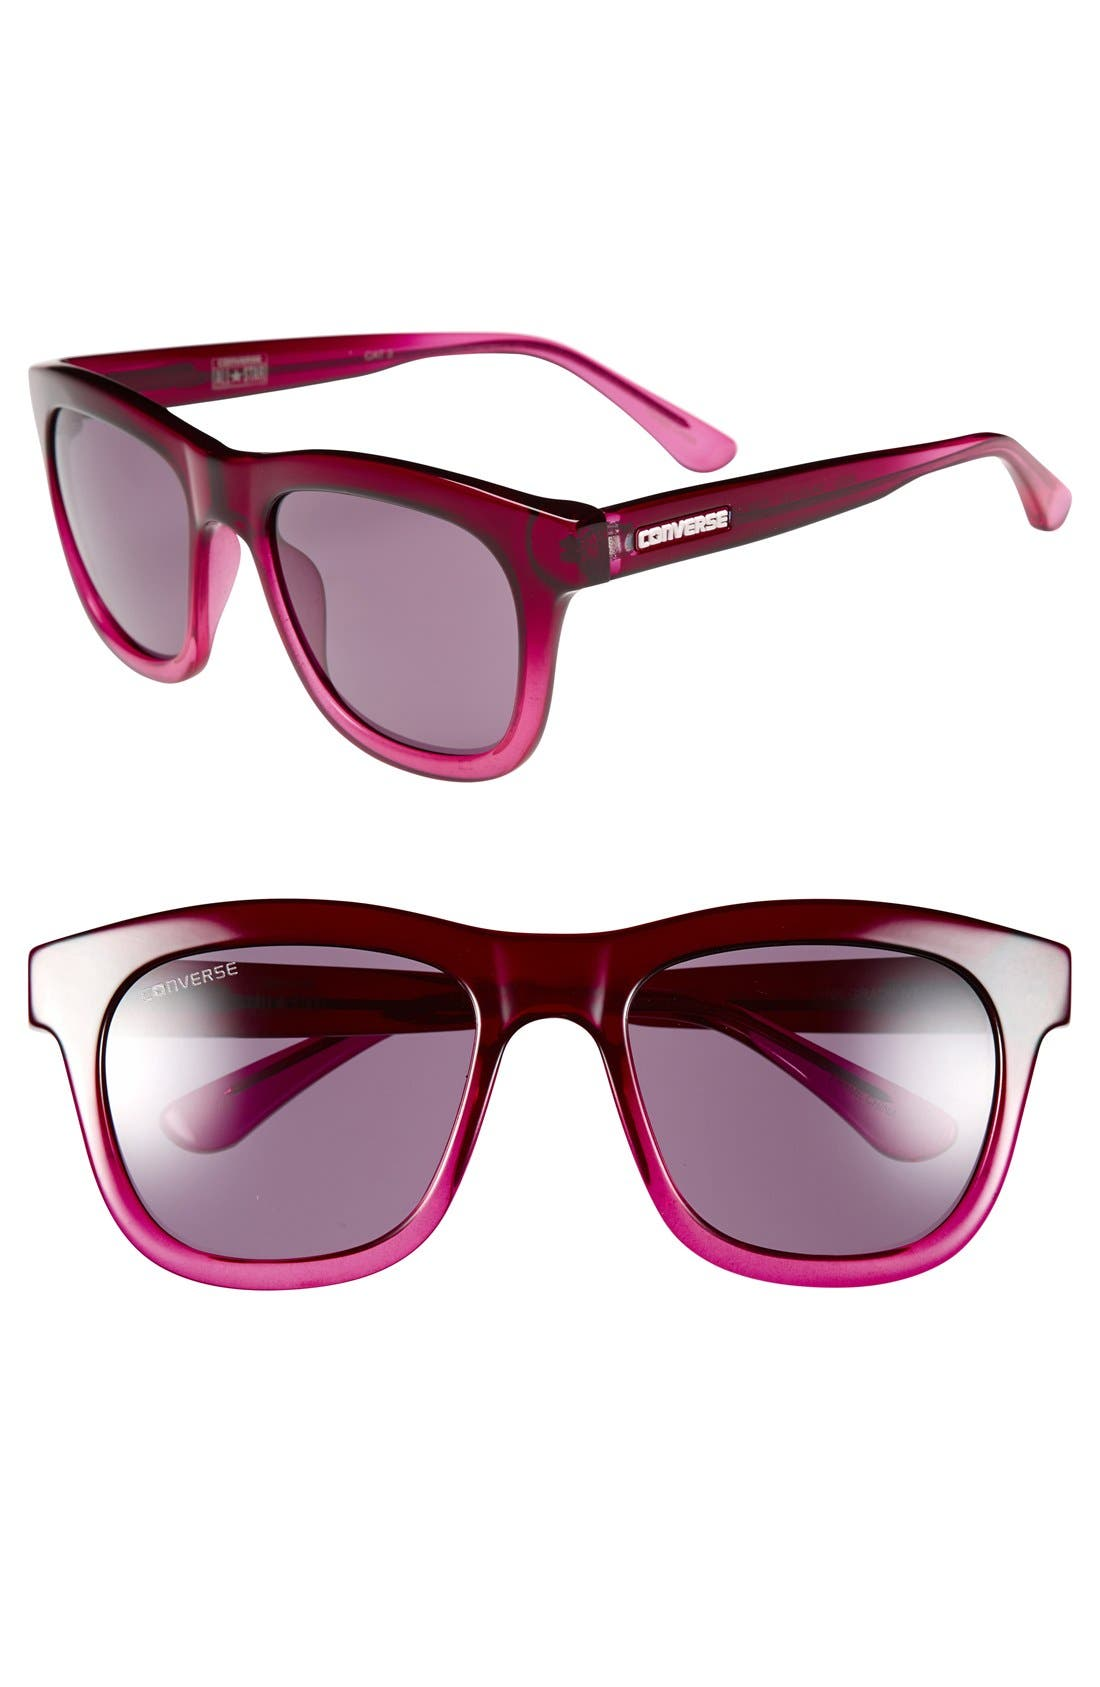 Alternate Image 1 Selected - Converse 54mm Retro Sunglasses